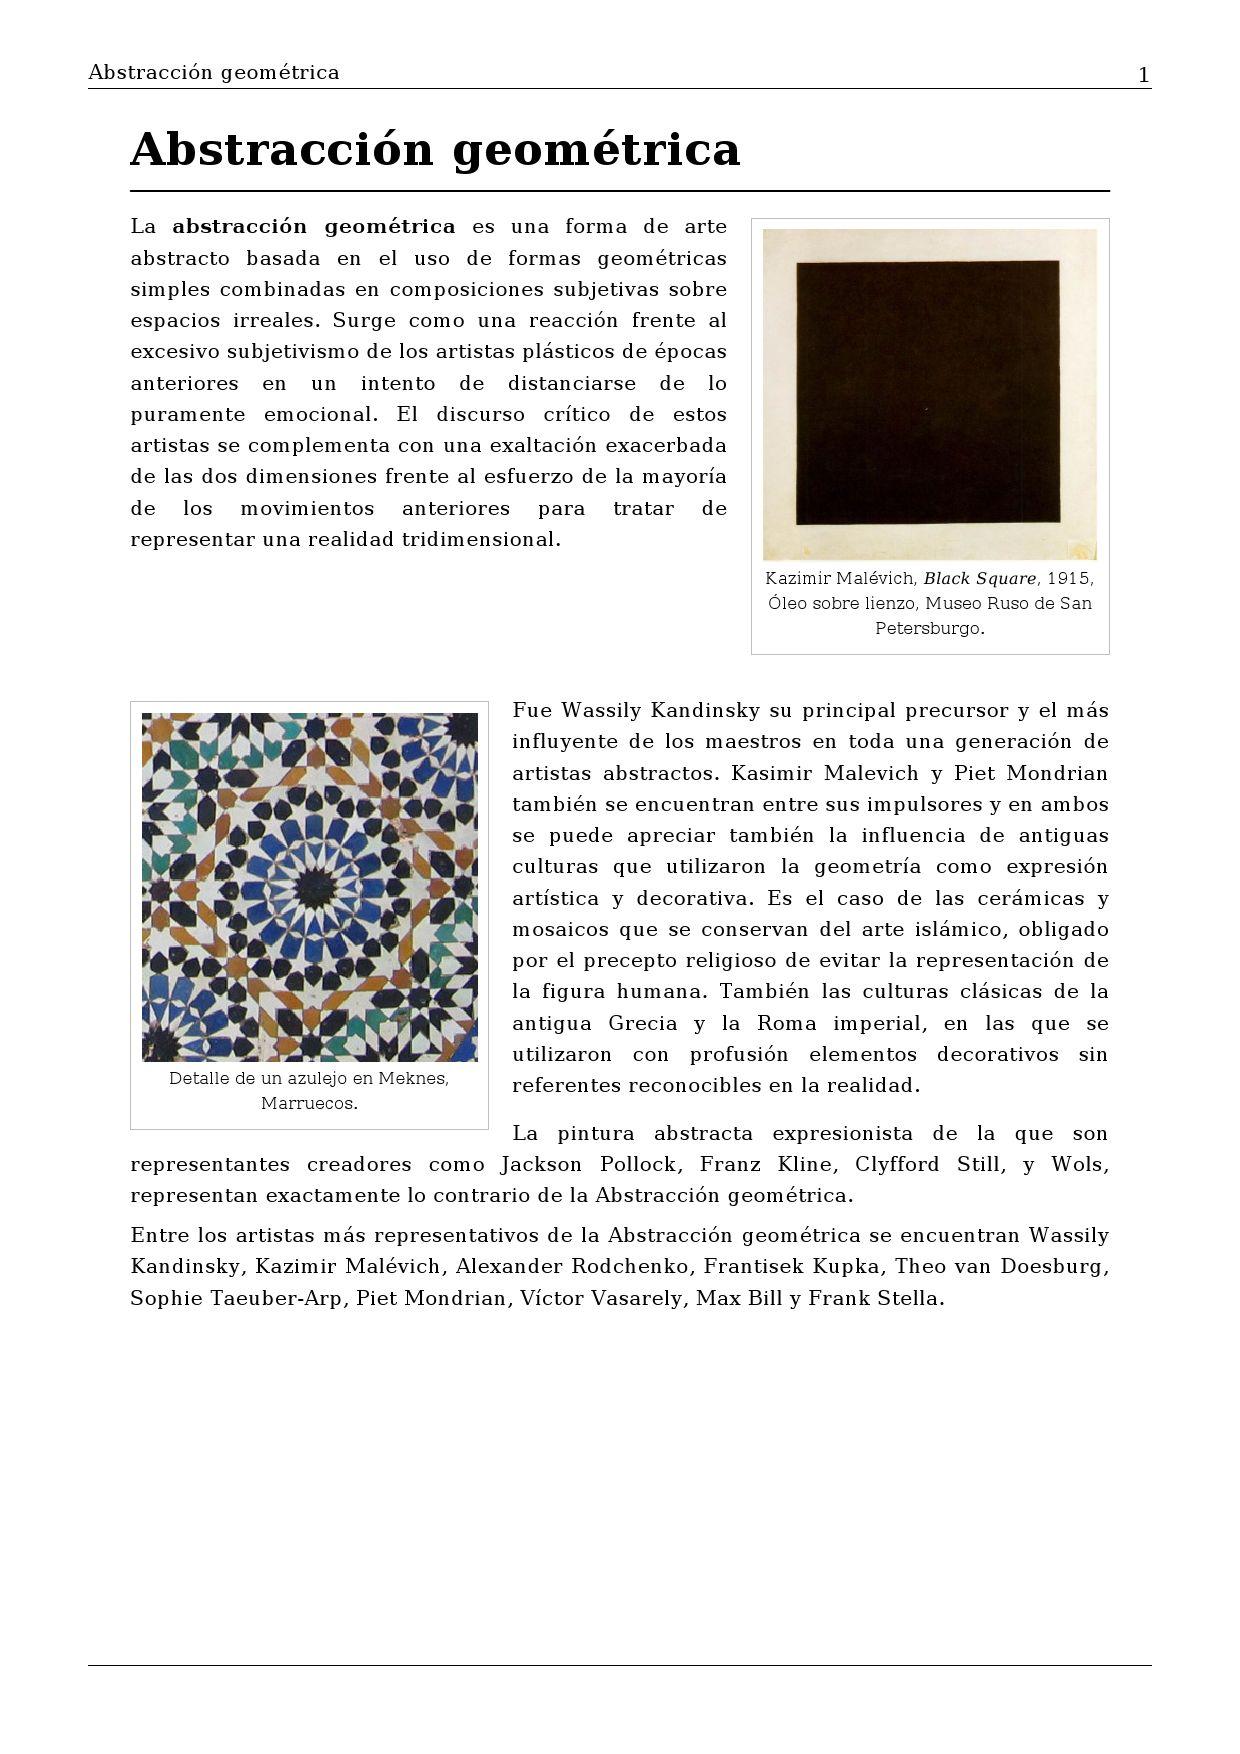 Apuntes para Taller de Escultura by Omar Gasca - issuu